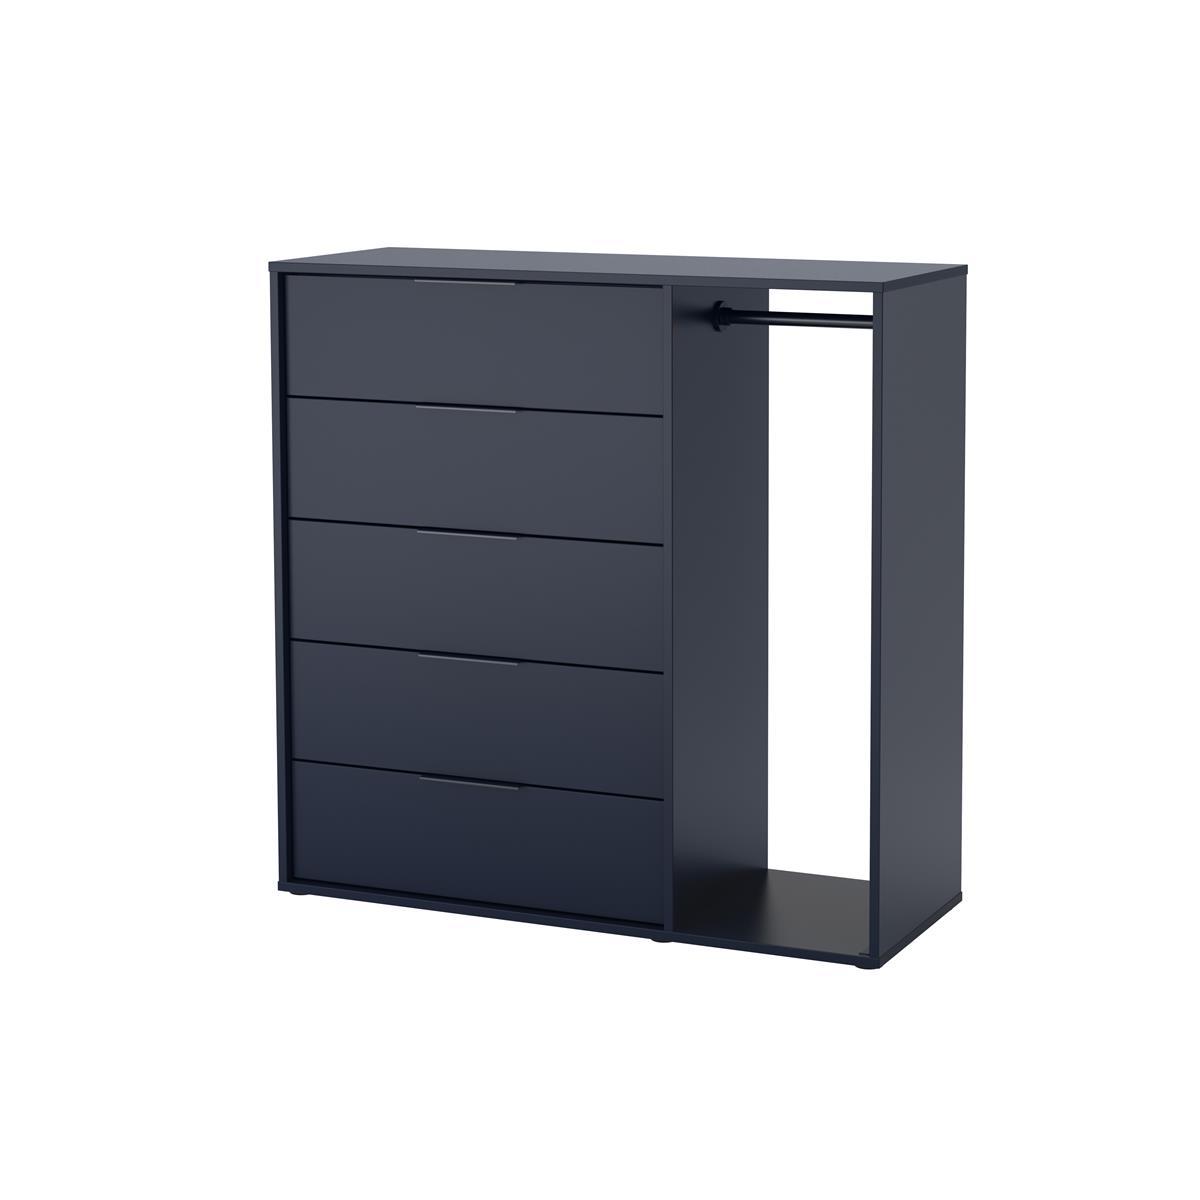 Ikea limited edition 2019 novit diredonna - Bastone appendiabiti ikea ...